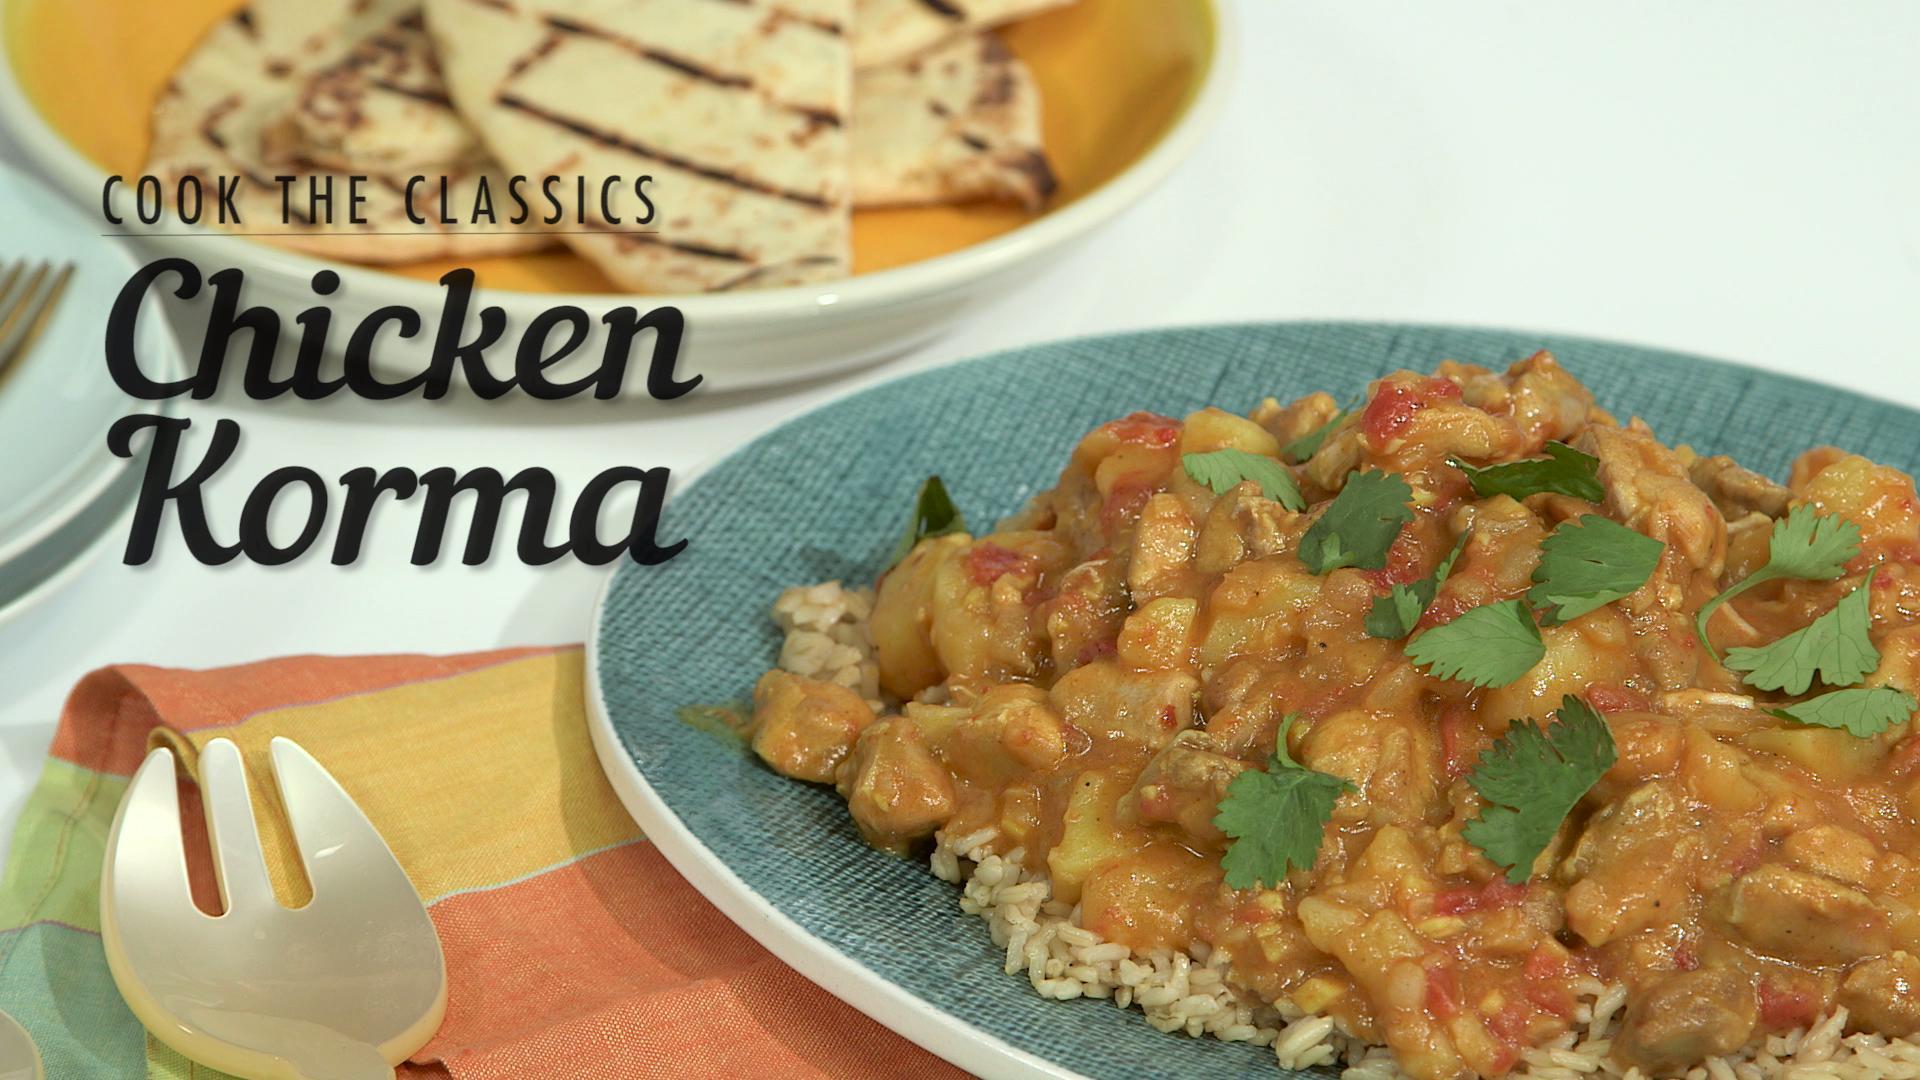 How to Make Classic Chicken Korma